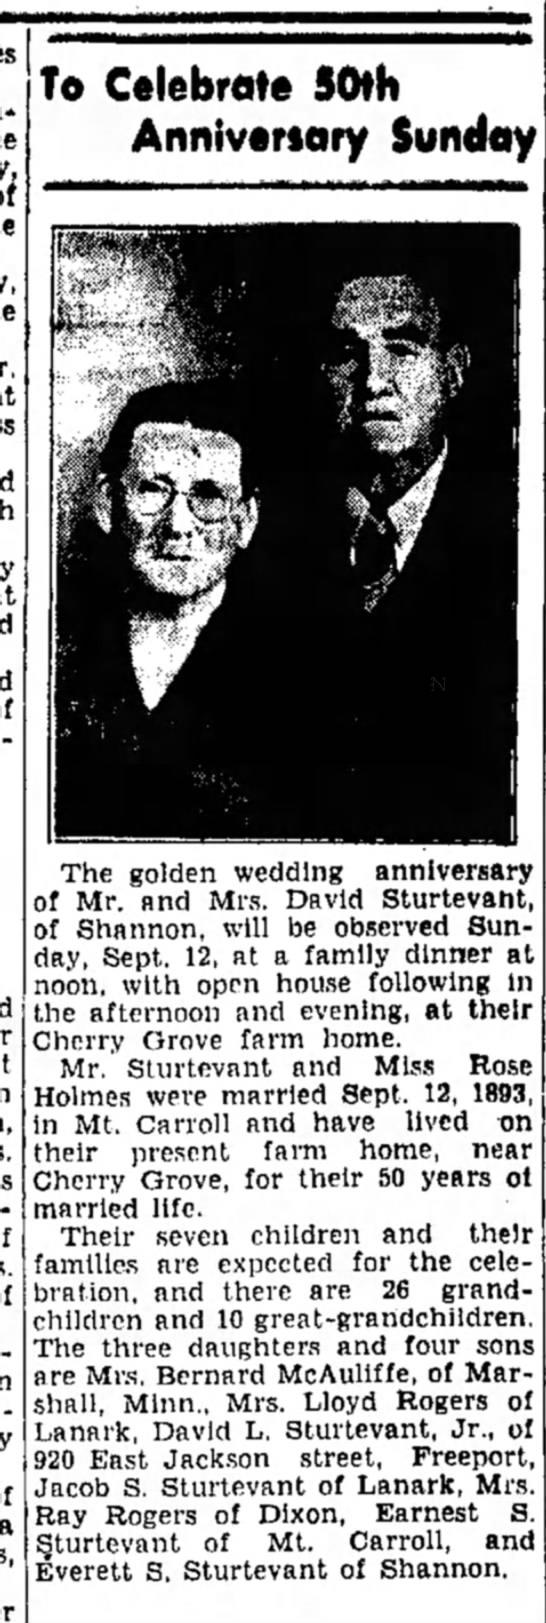 David and Rose Sturtevant 50th anniversary -